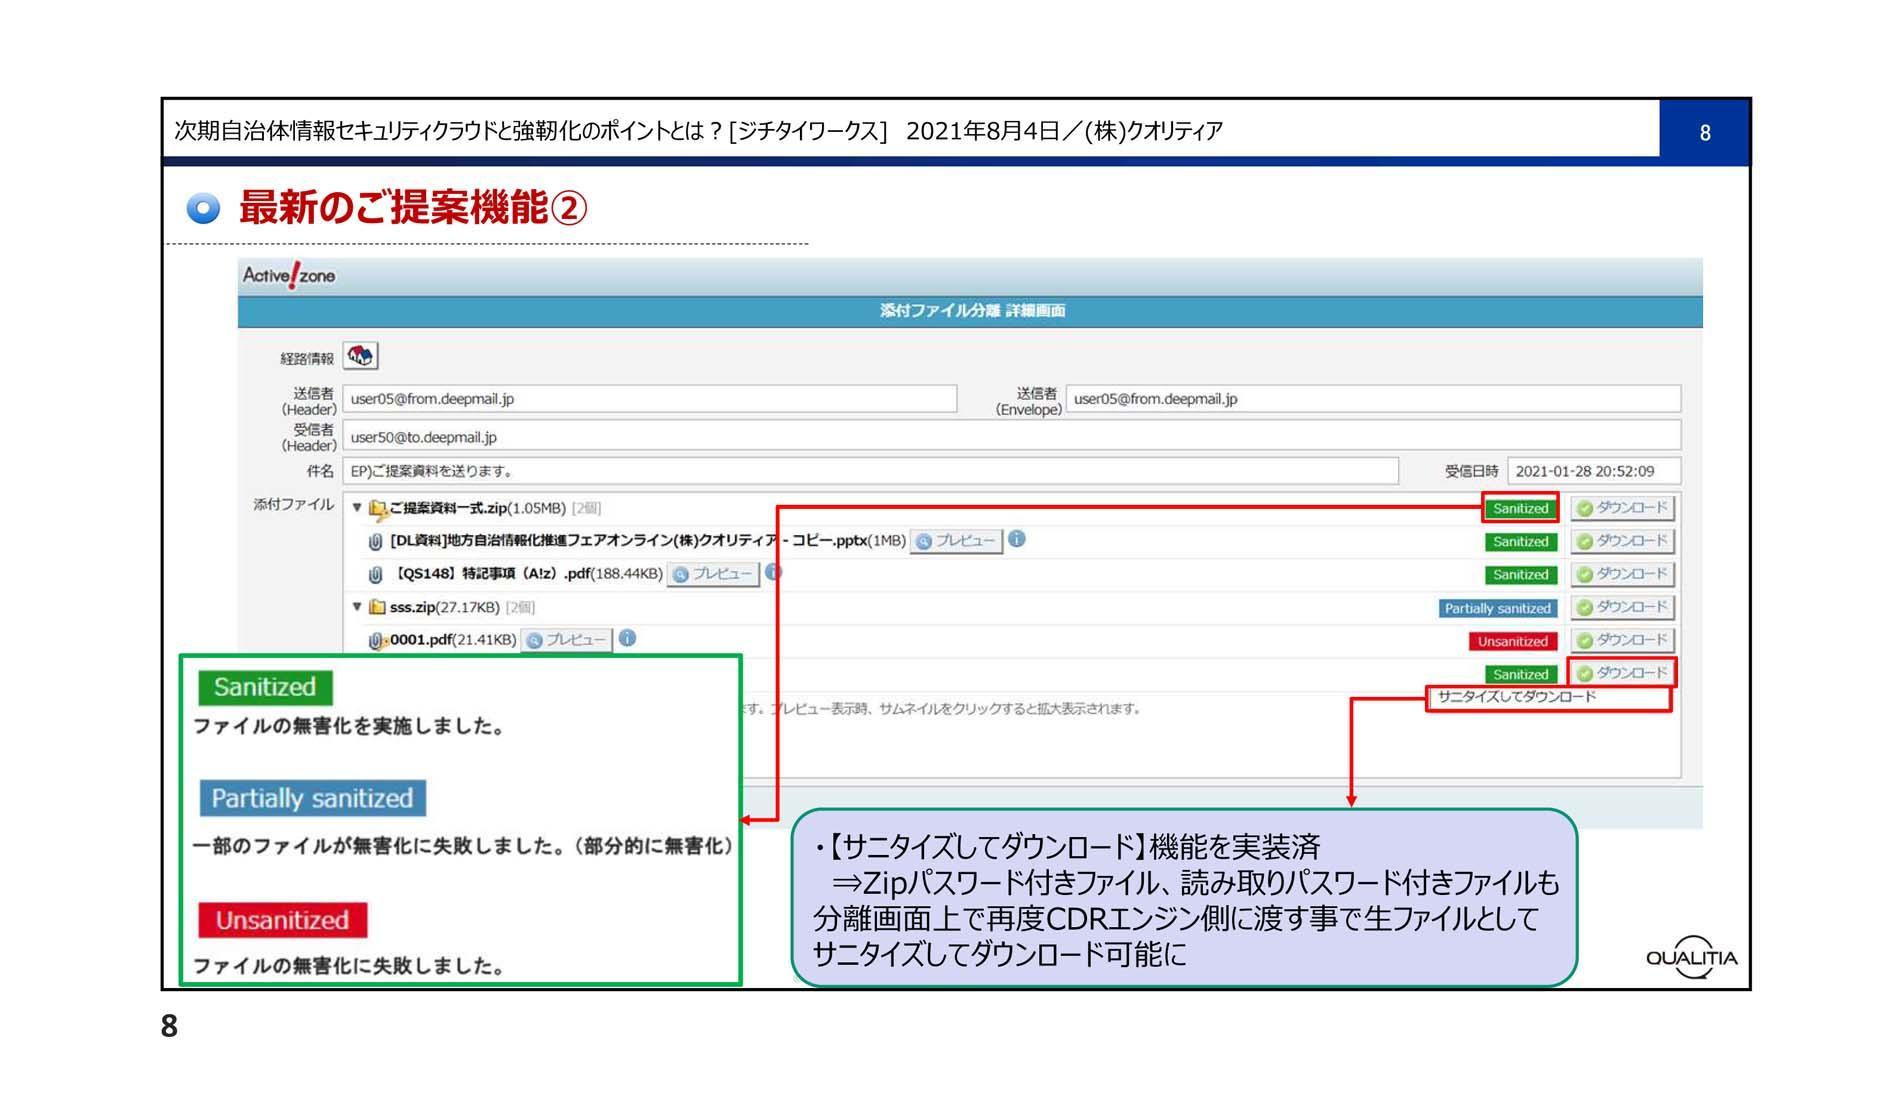 C:\Users\lma-Five\Desktop\オーバル セミレポ\採用画像jpg\2-04.jpg